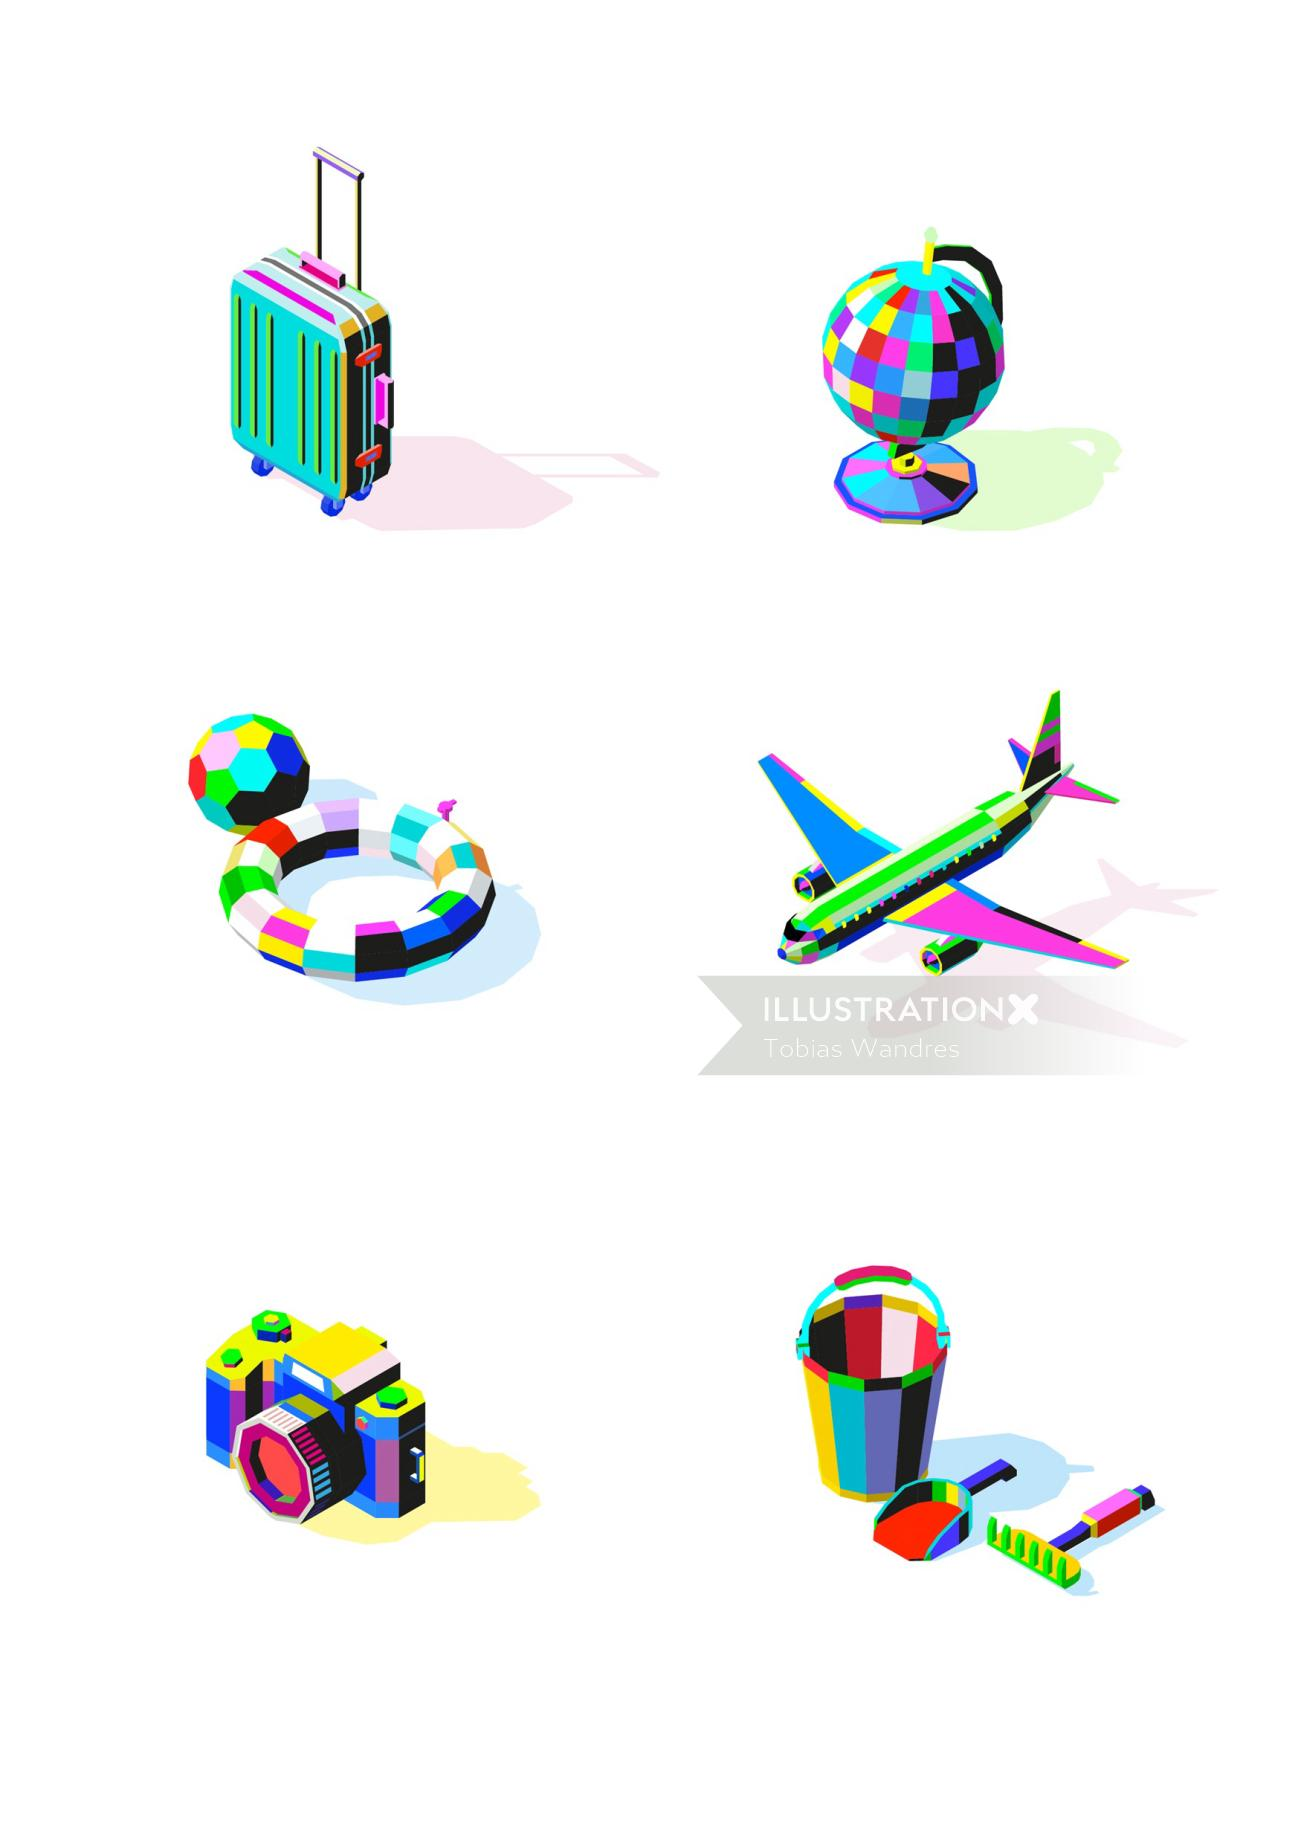 Kids toy icons illustration